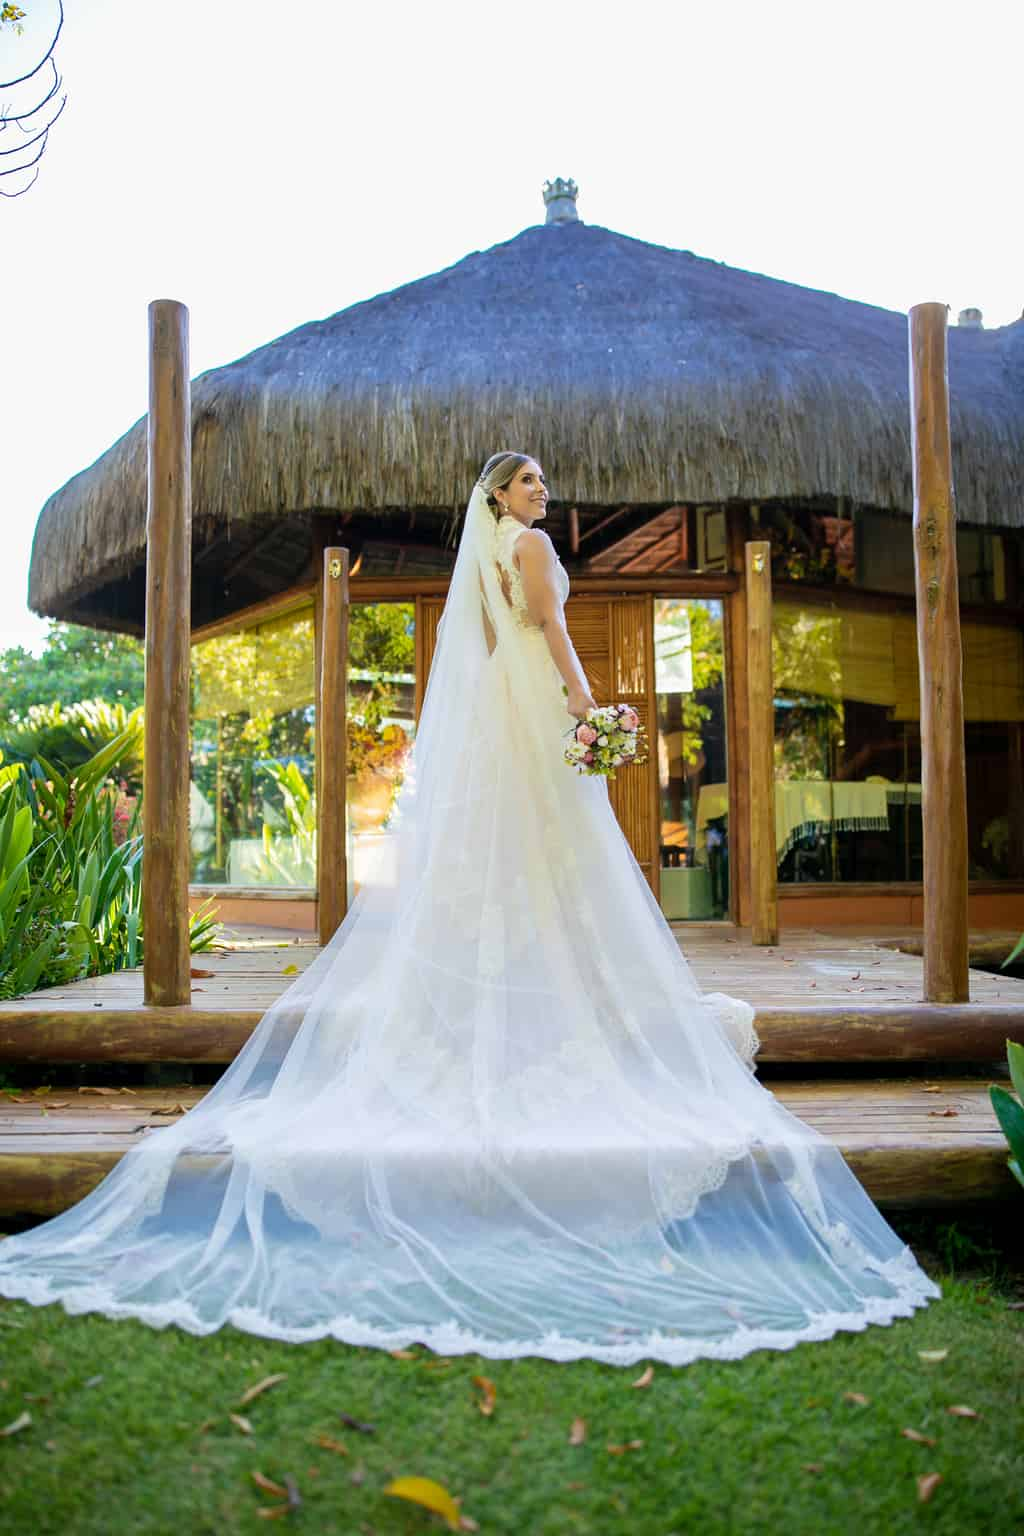 casamento-Taina-e-Hugo-Itapororoca-Villa-Trancoso-Patricia-Galvao-Sotter-Fotografia-Cerimonia-na-praia476